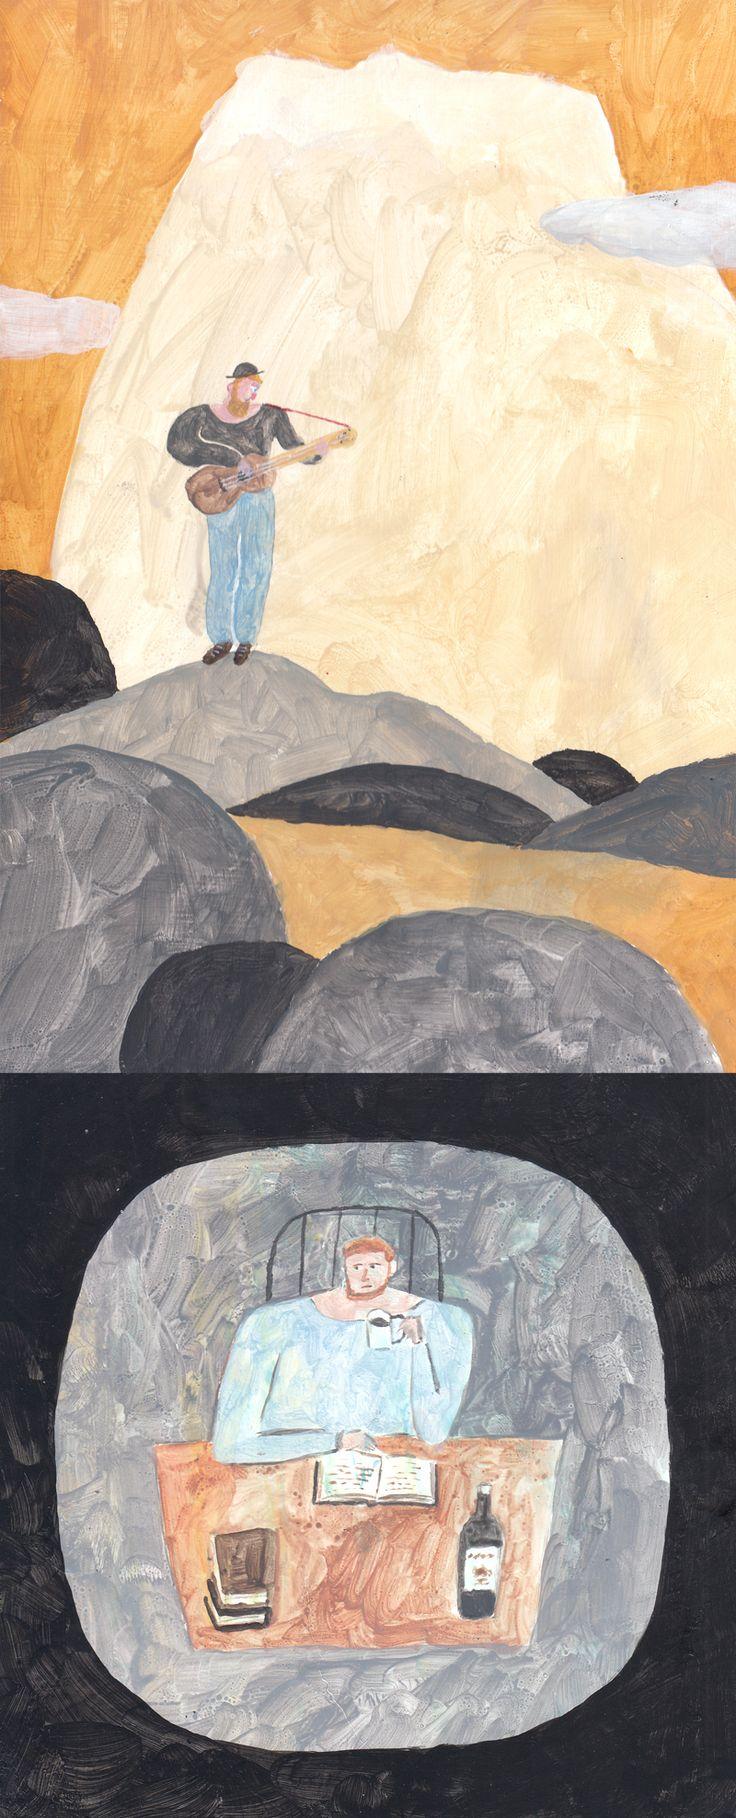 kohei ashino illustration 芦野公平 イラストレーションkohei ashino